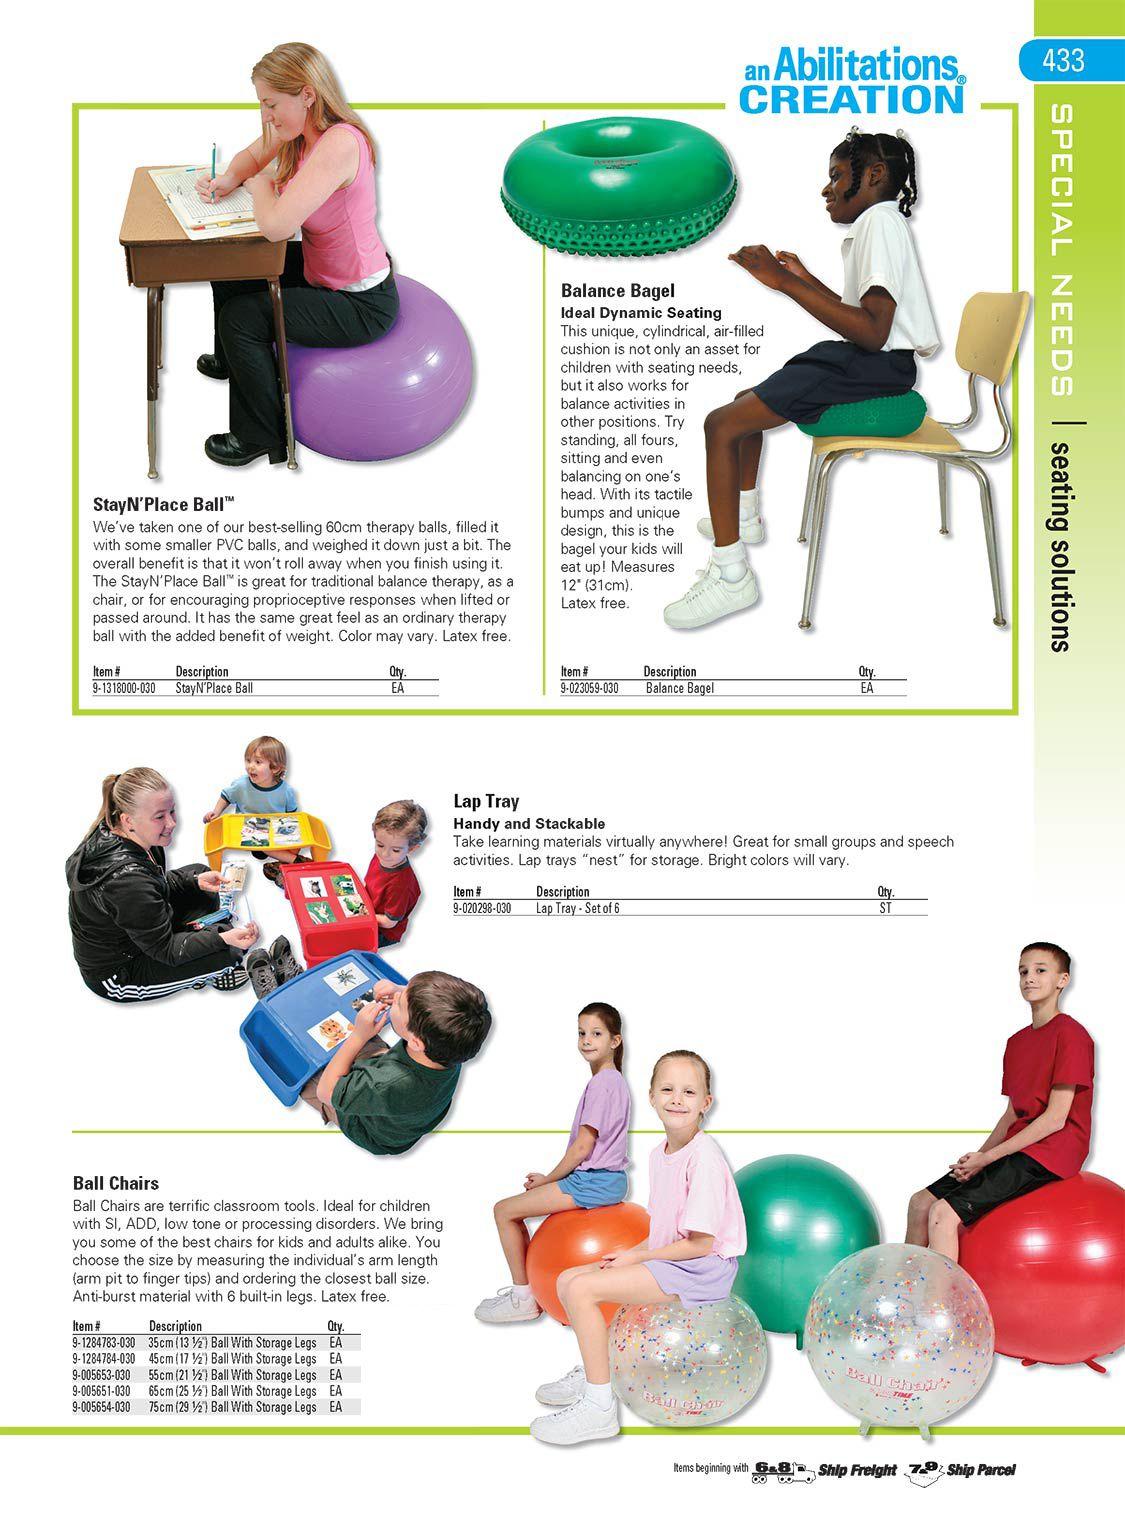 Abilitations Integrations 6 Leg Ball Chair 14 In Dia